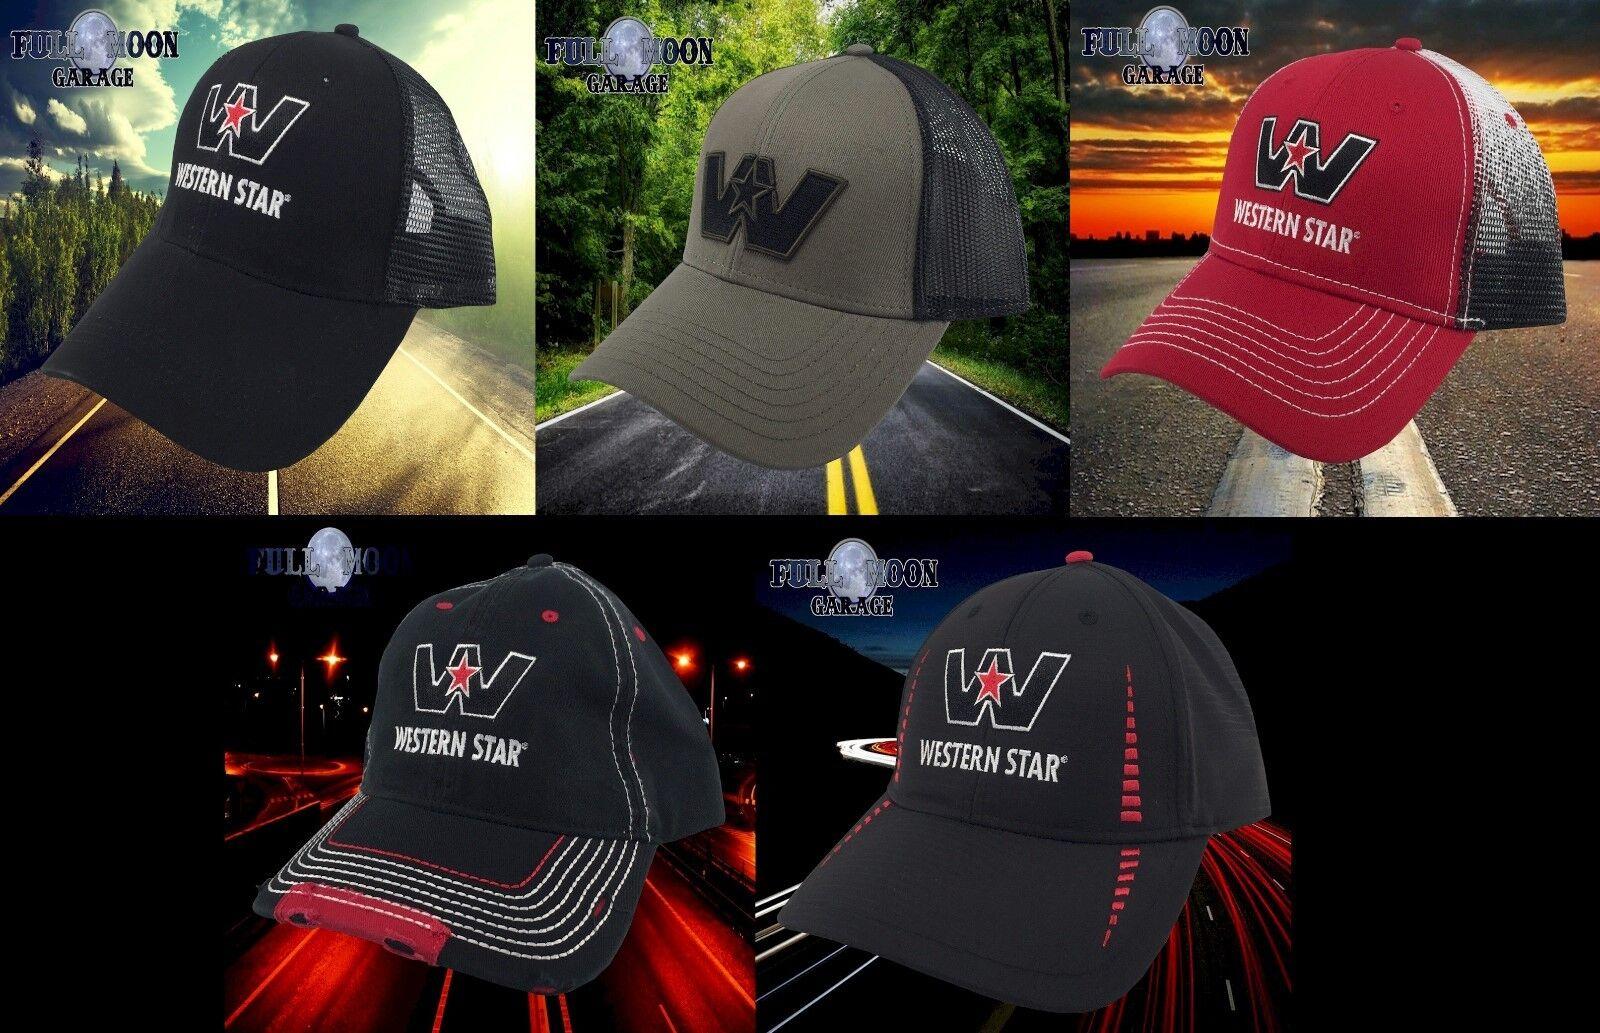 New Snapback Western Star Trucks Tractor Trailer Trucker Mens Snapback New Cap Hat d282cd